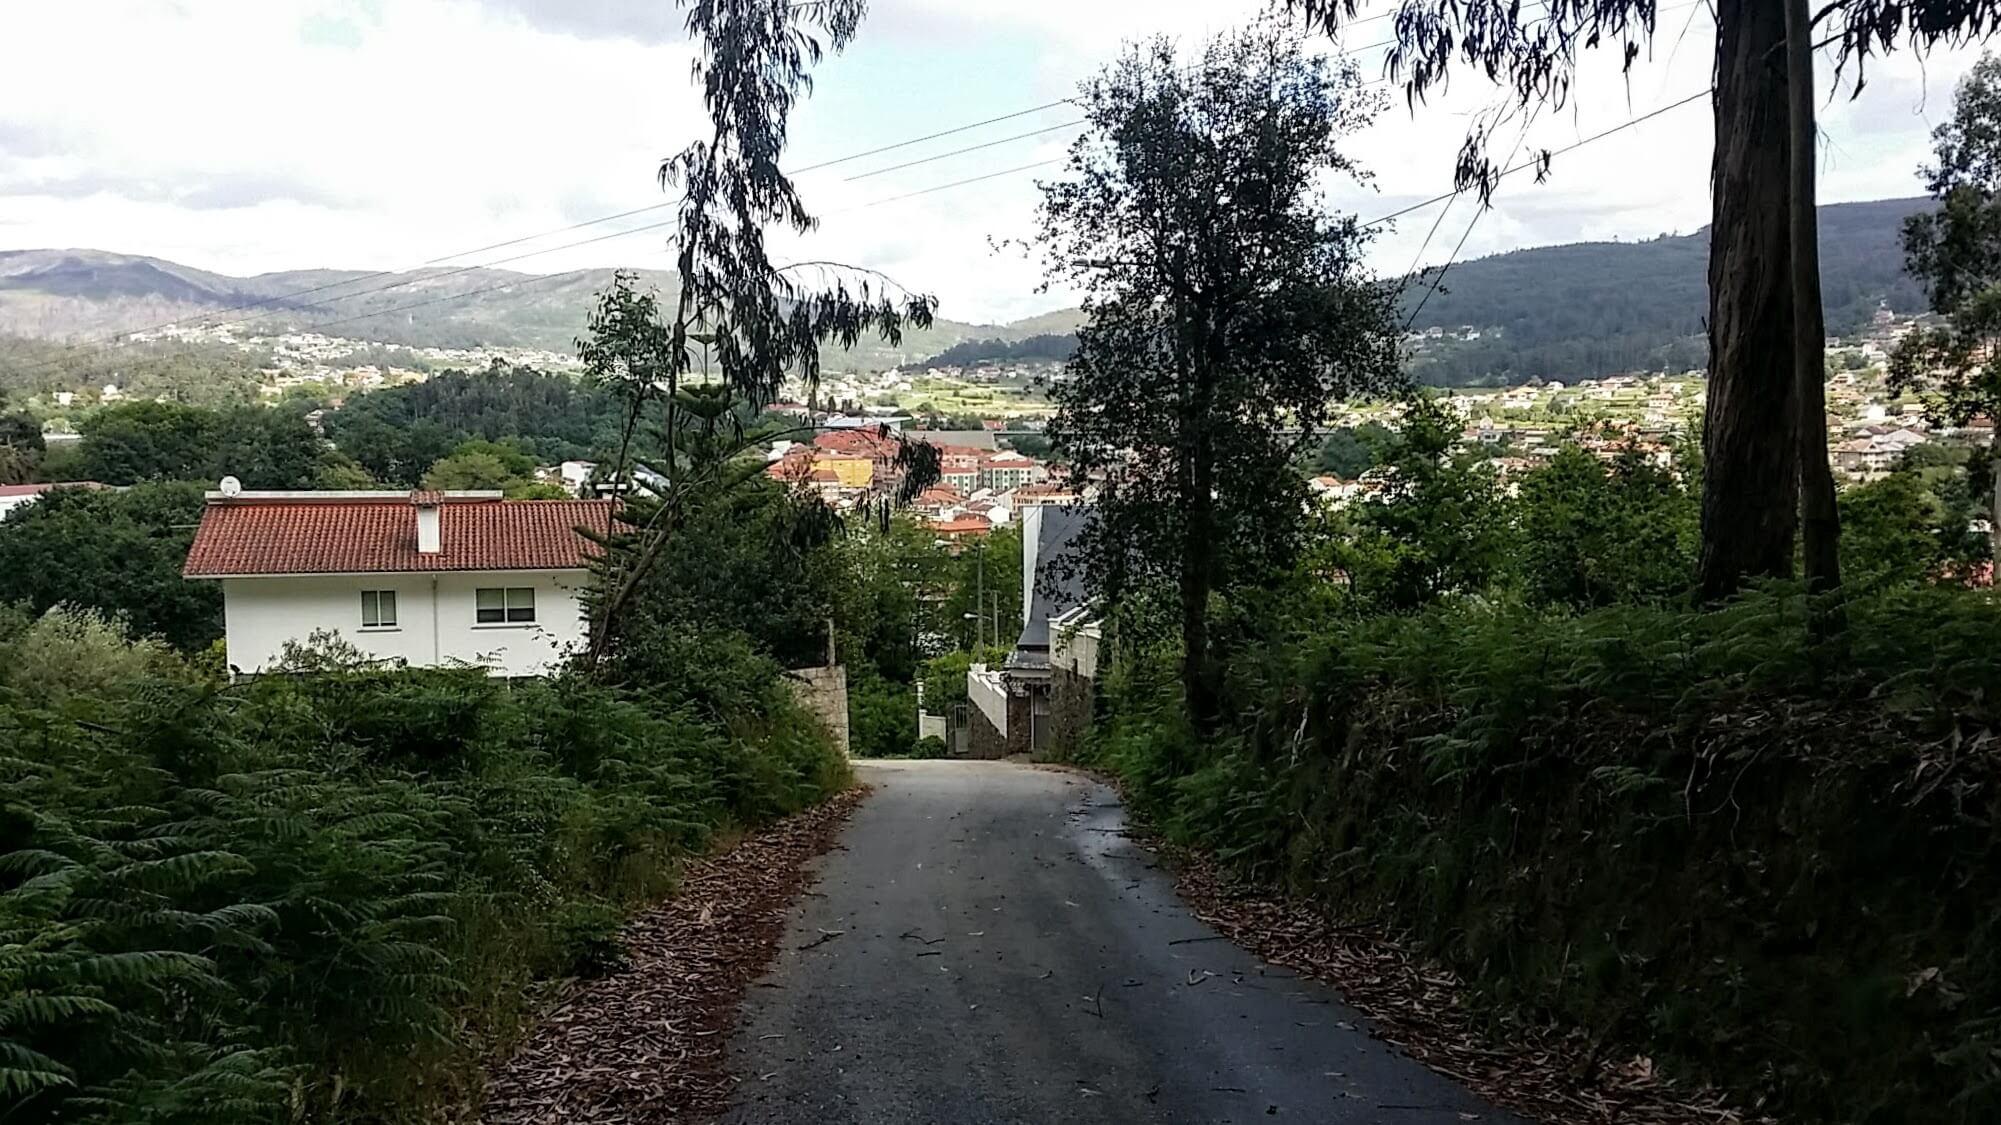 The narrow Camiño das Cardosas into Redondela on day twenty-one of the Camino Portugués